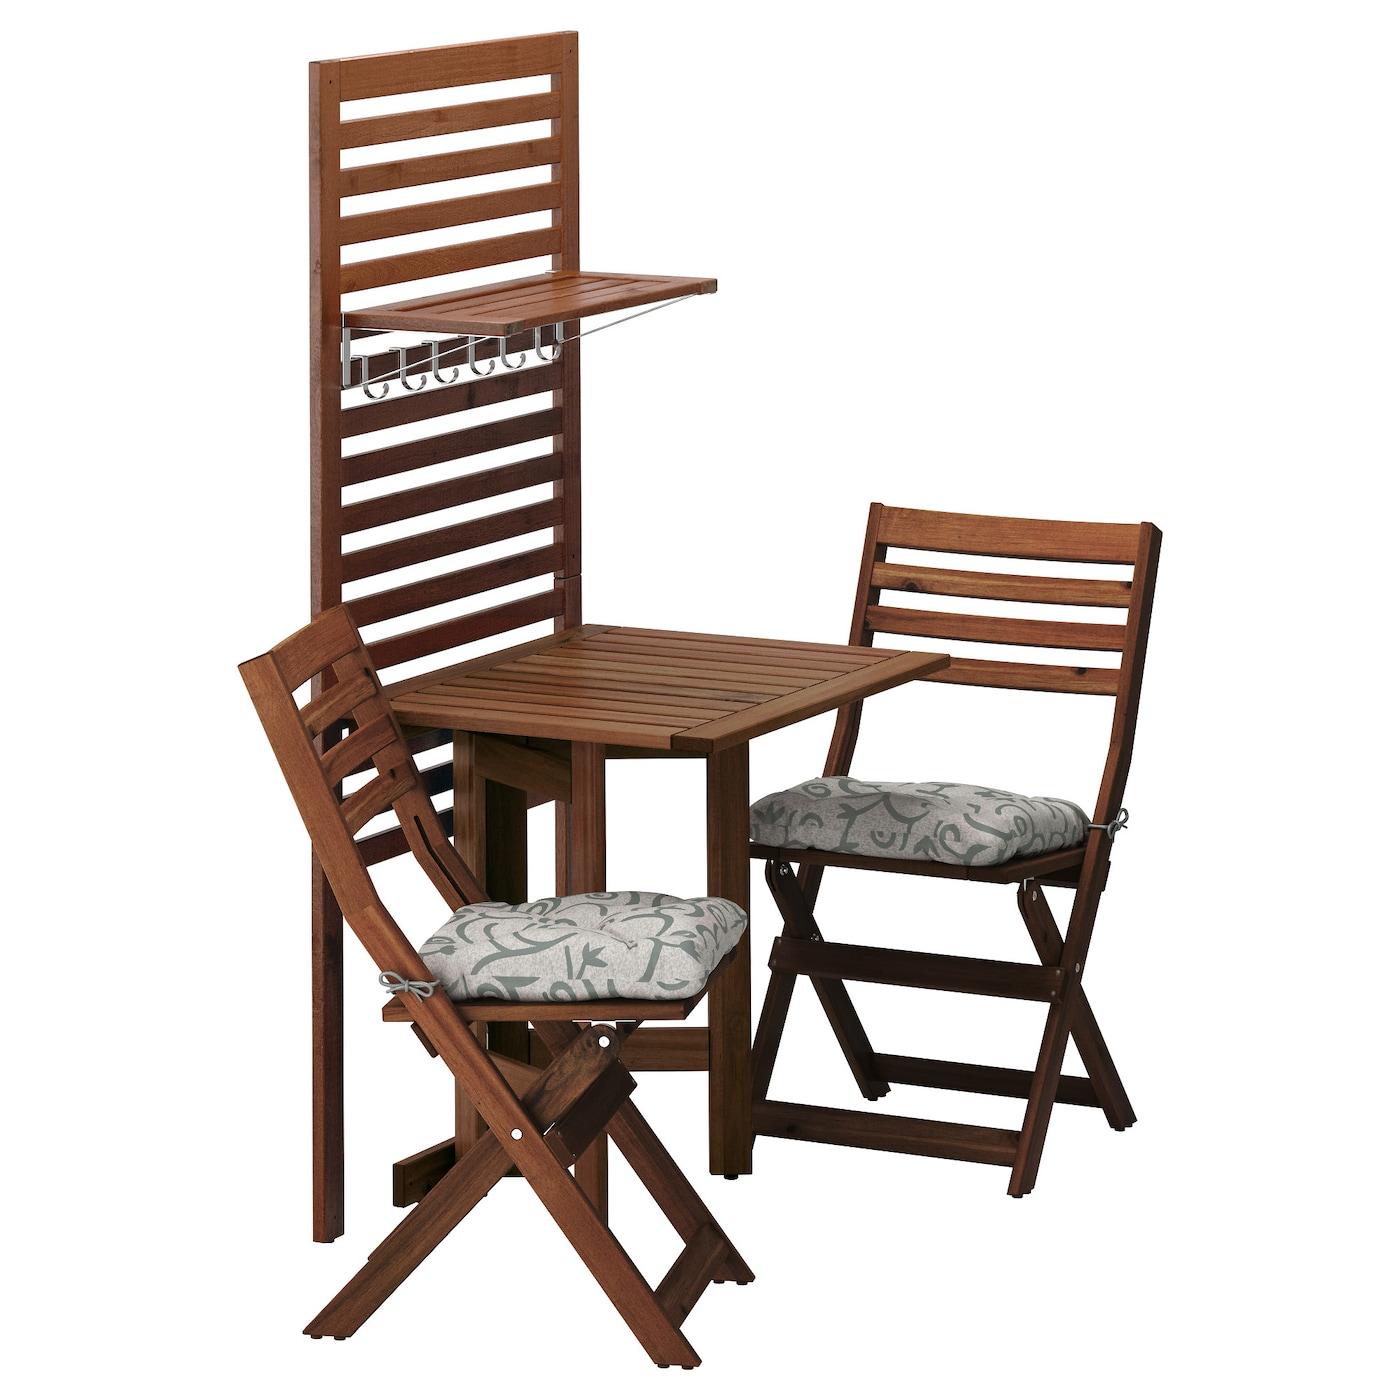 pplar ikea. Black Bedroom Furniture Sets. Home Design Ideas